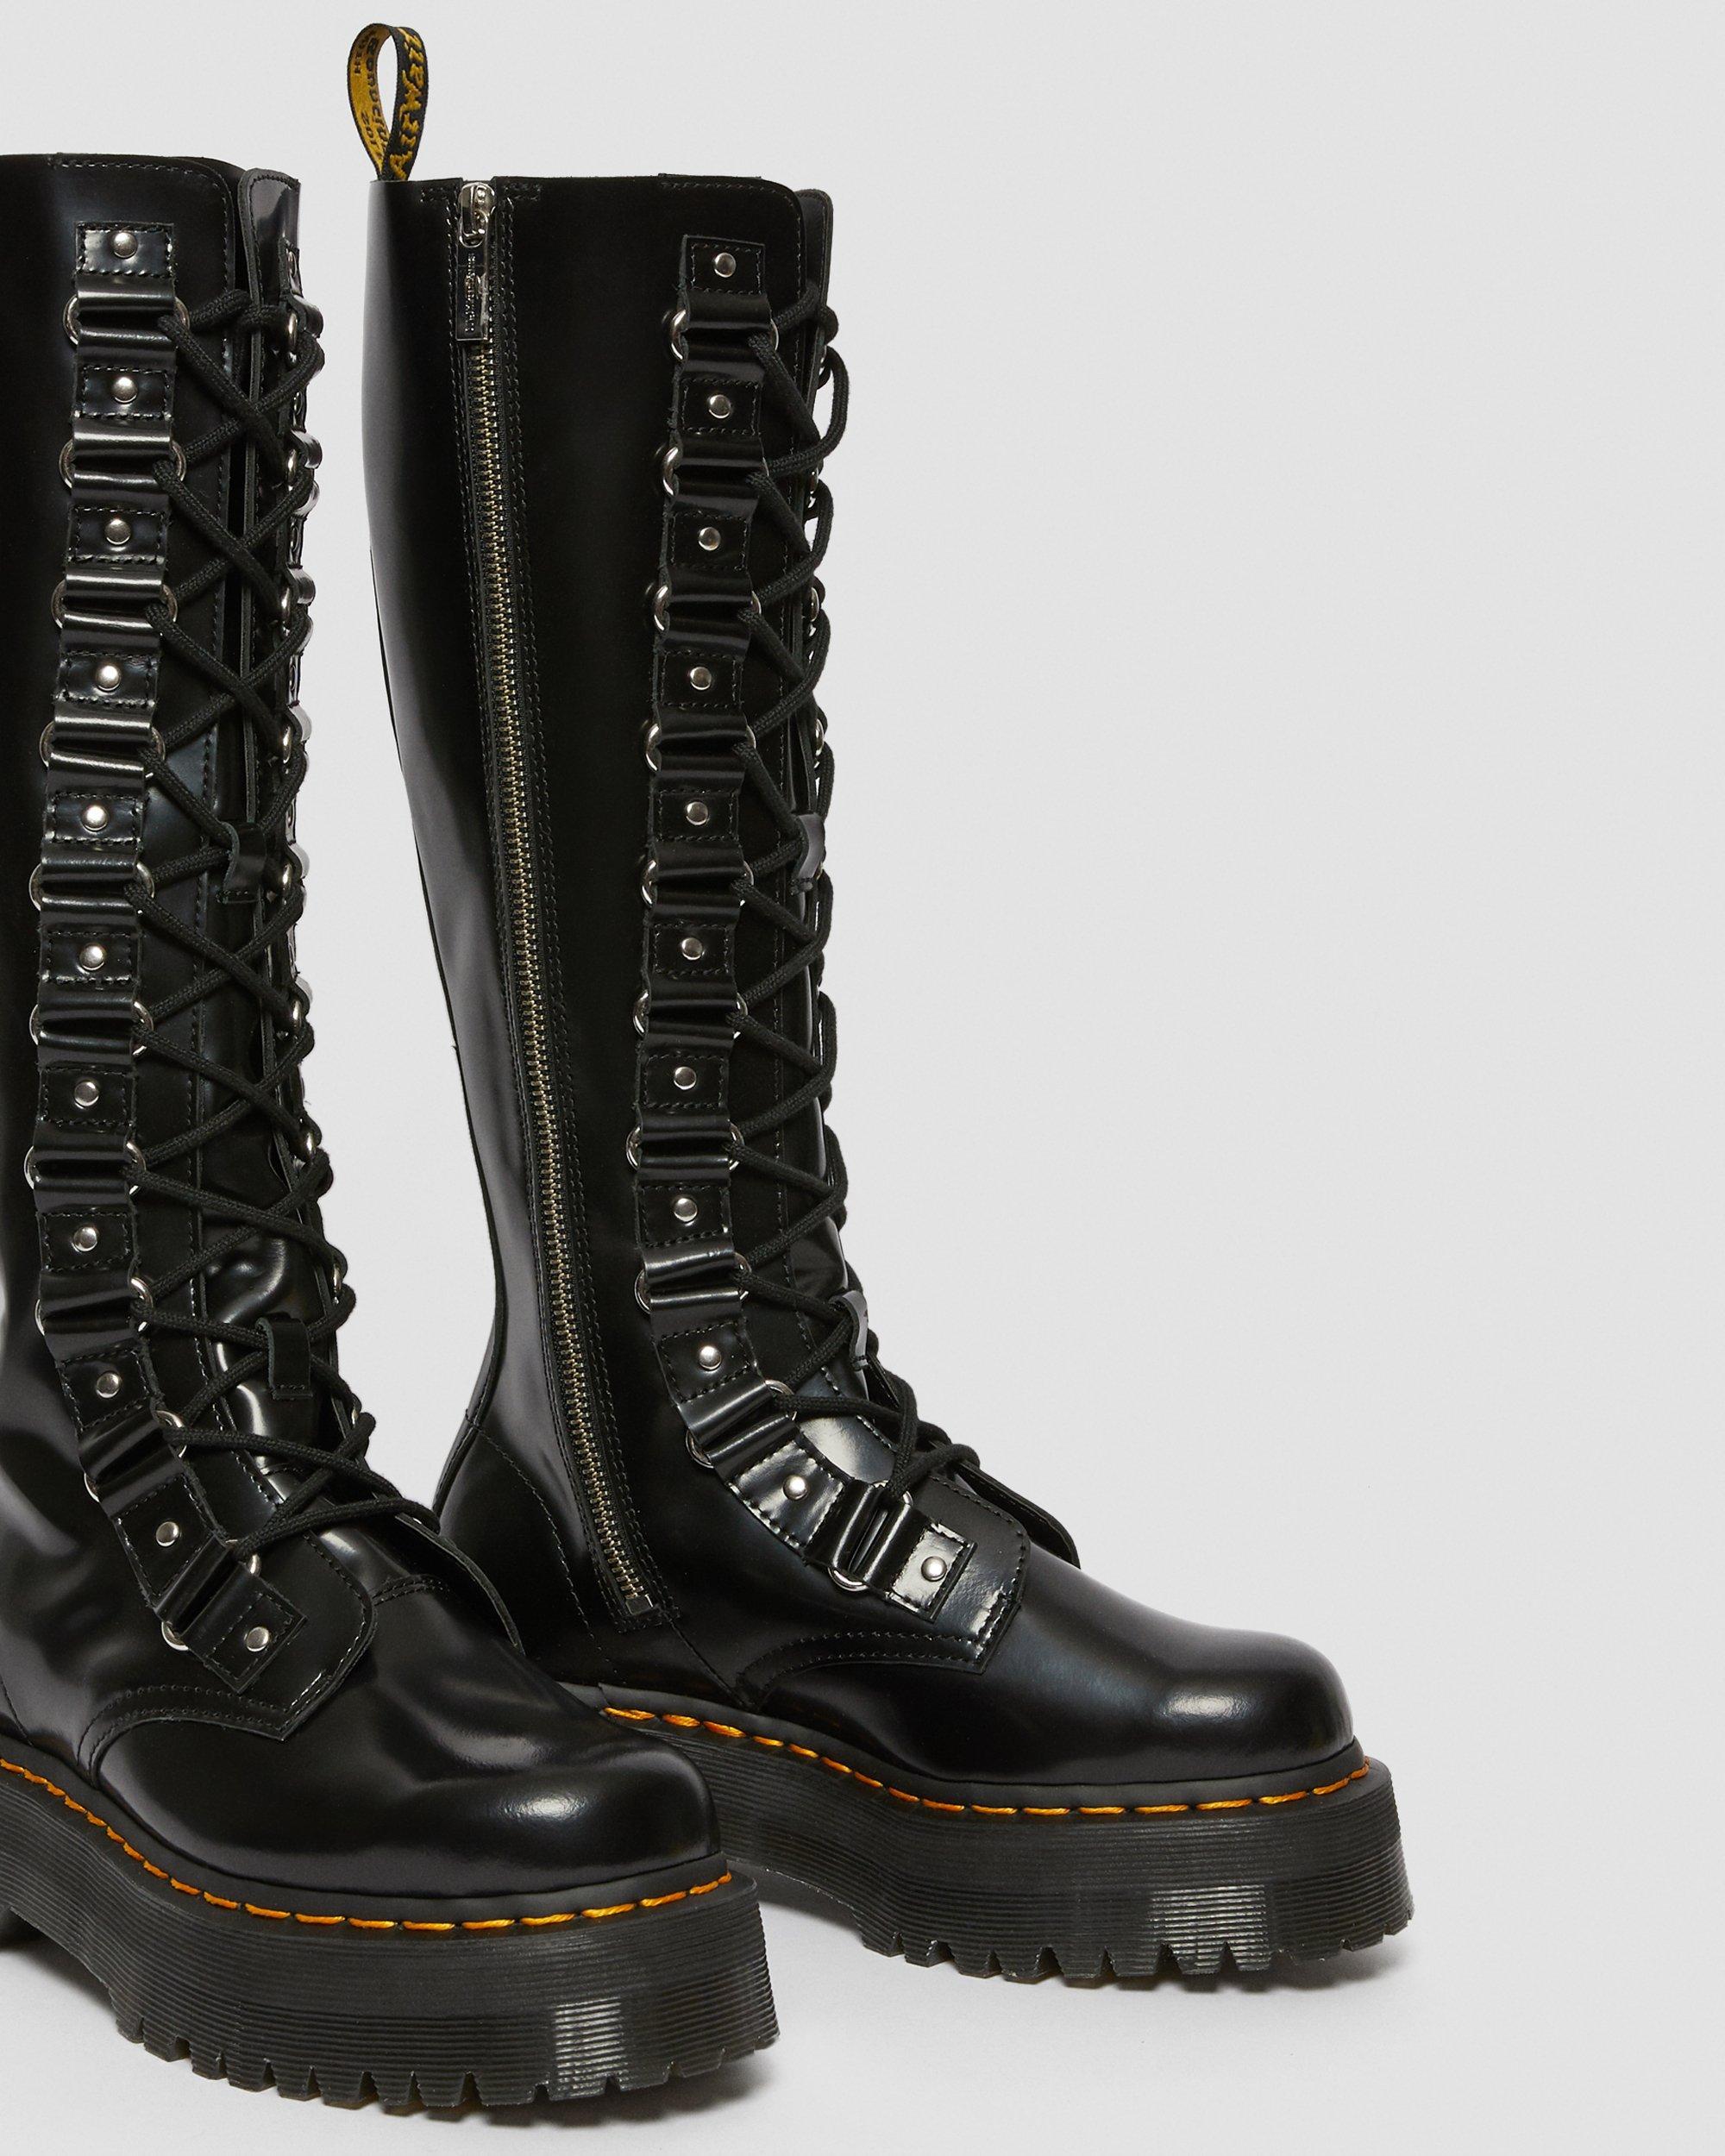 doc martin high boots